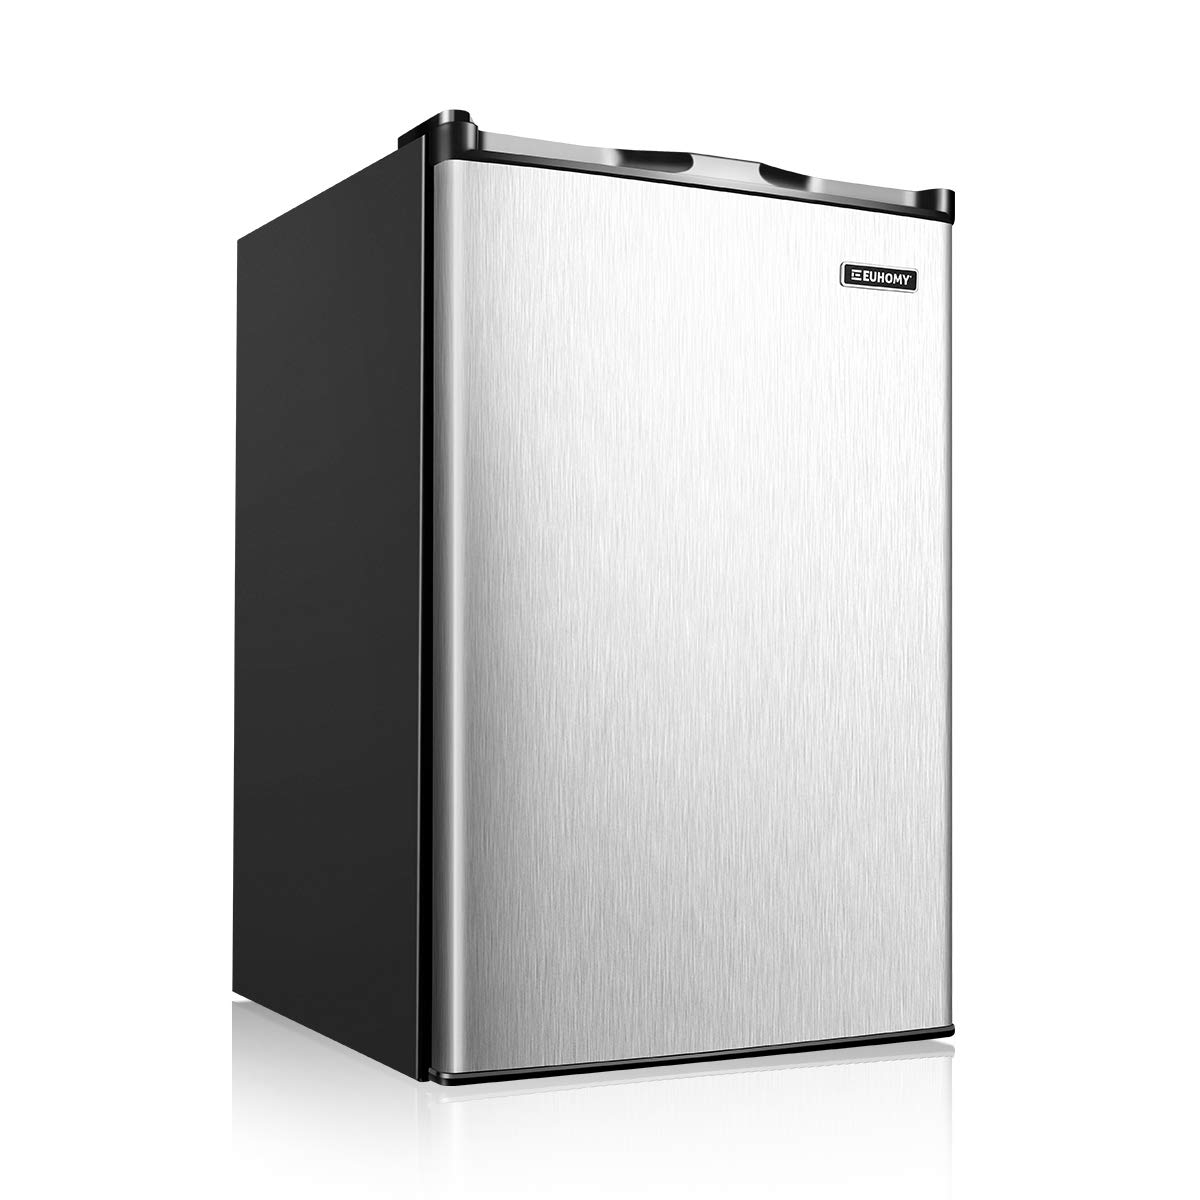 Euhomy Upright Freezer, 3.0 Cubic Feet,Compact Single Door Freezer with Reversible Stainless Steel Door,Mini Freezer for Home/Dorm/Apartment/Office(Sliver)